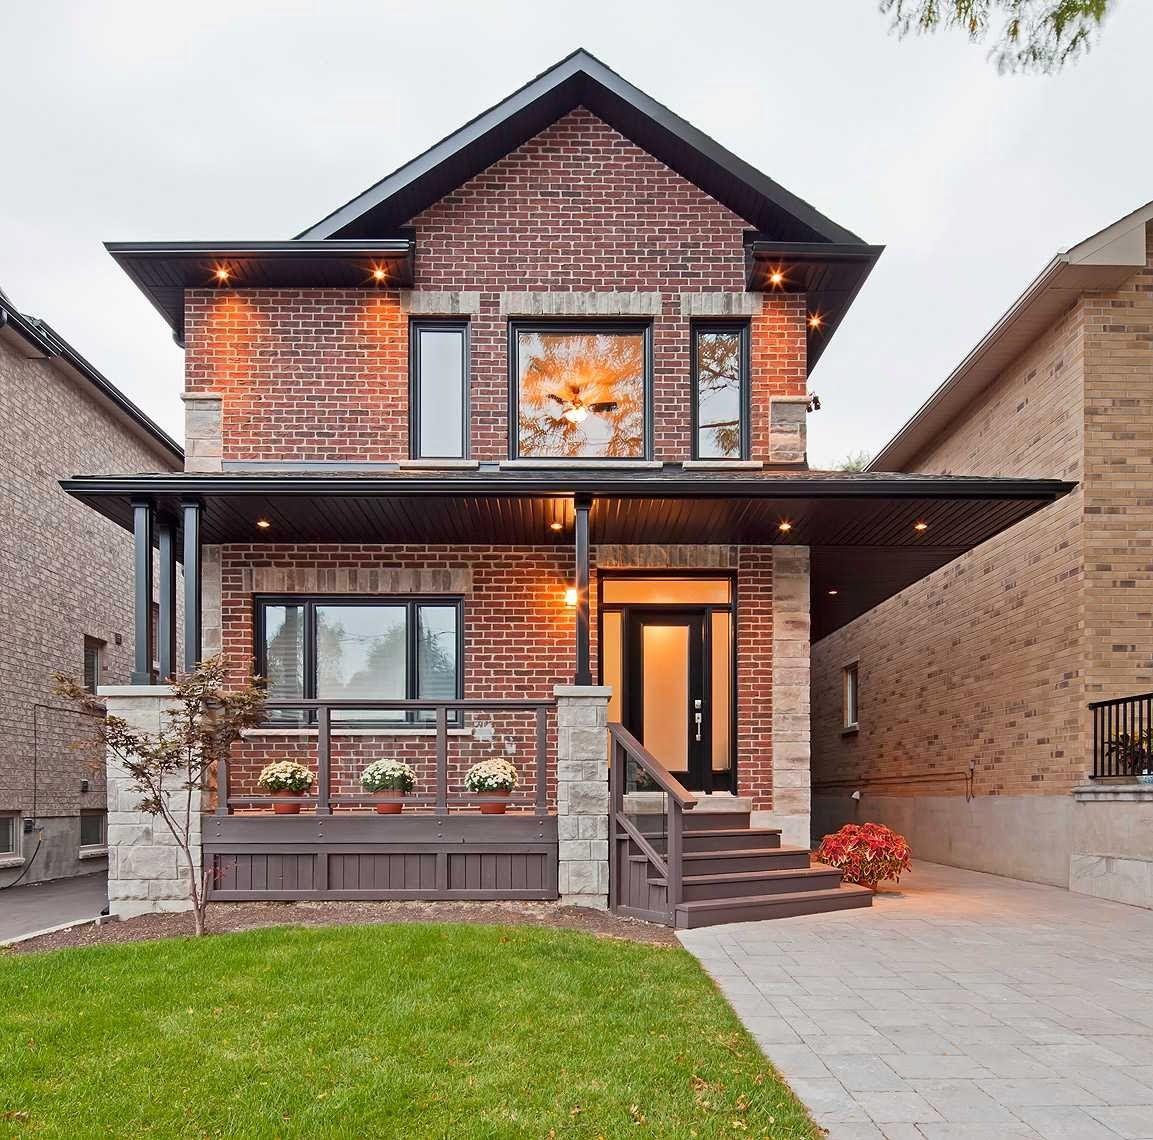 дизайн фасада частного дома снаружи